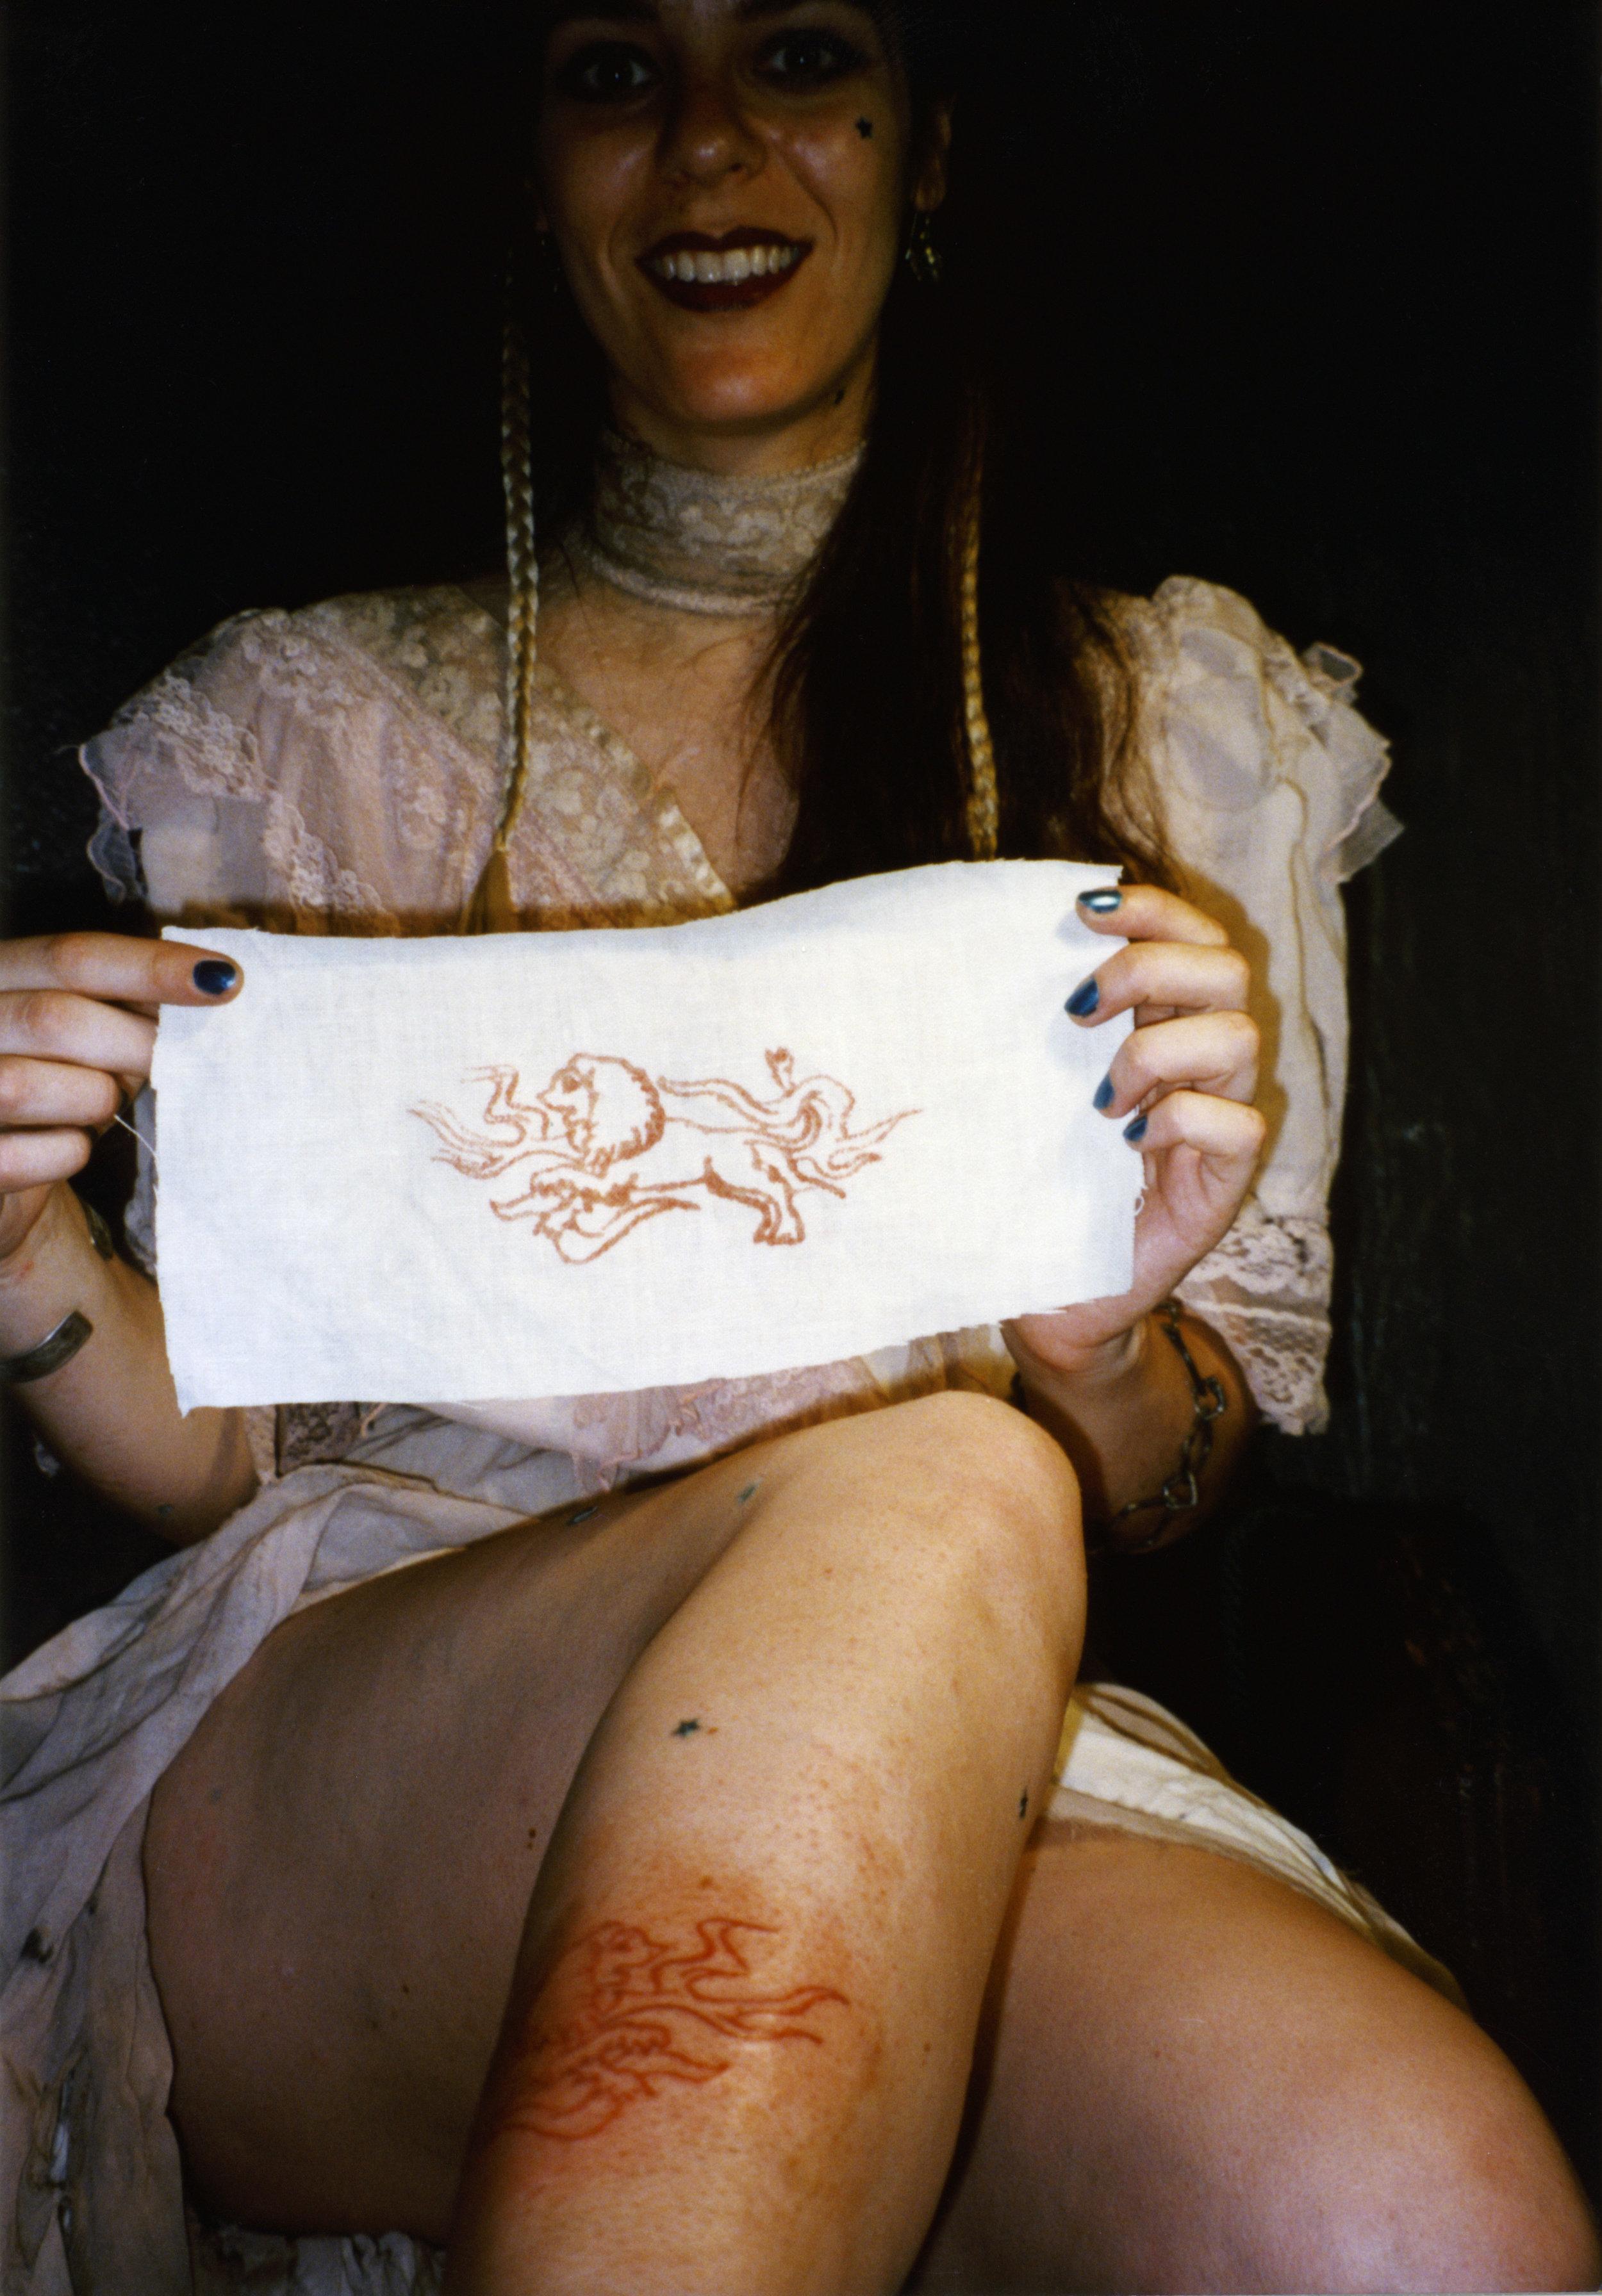 Inkless Tattoo with Matty Jankowski 1996